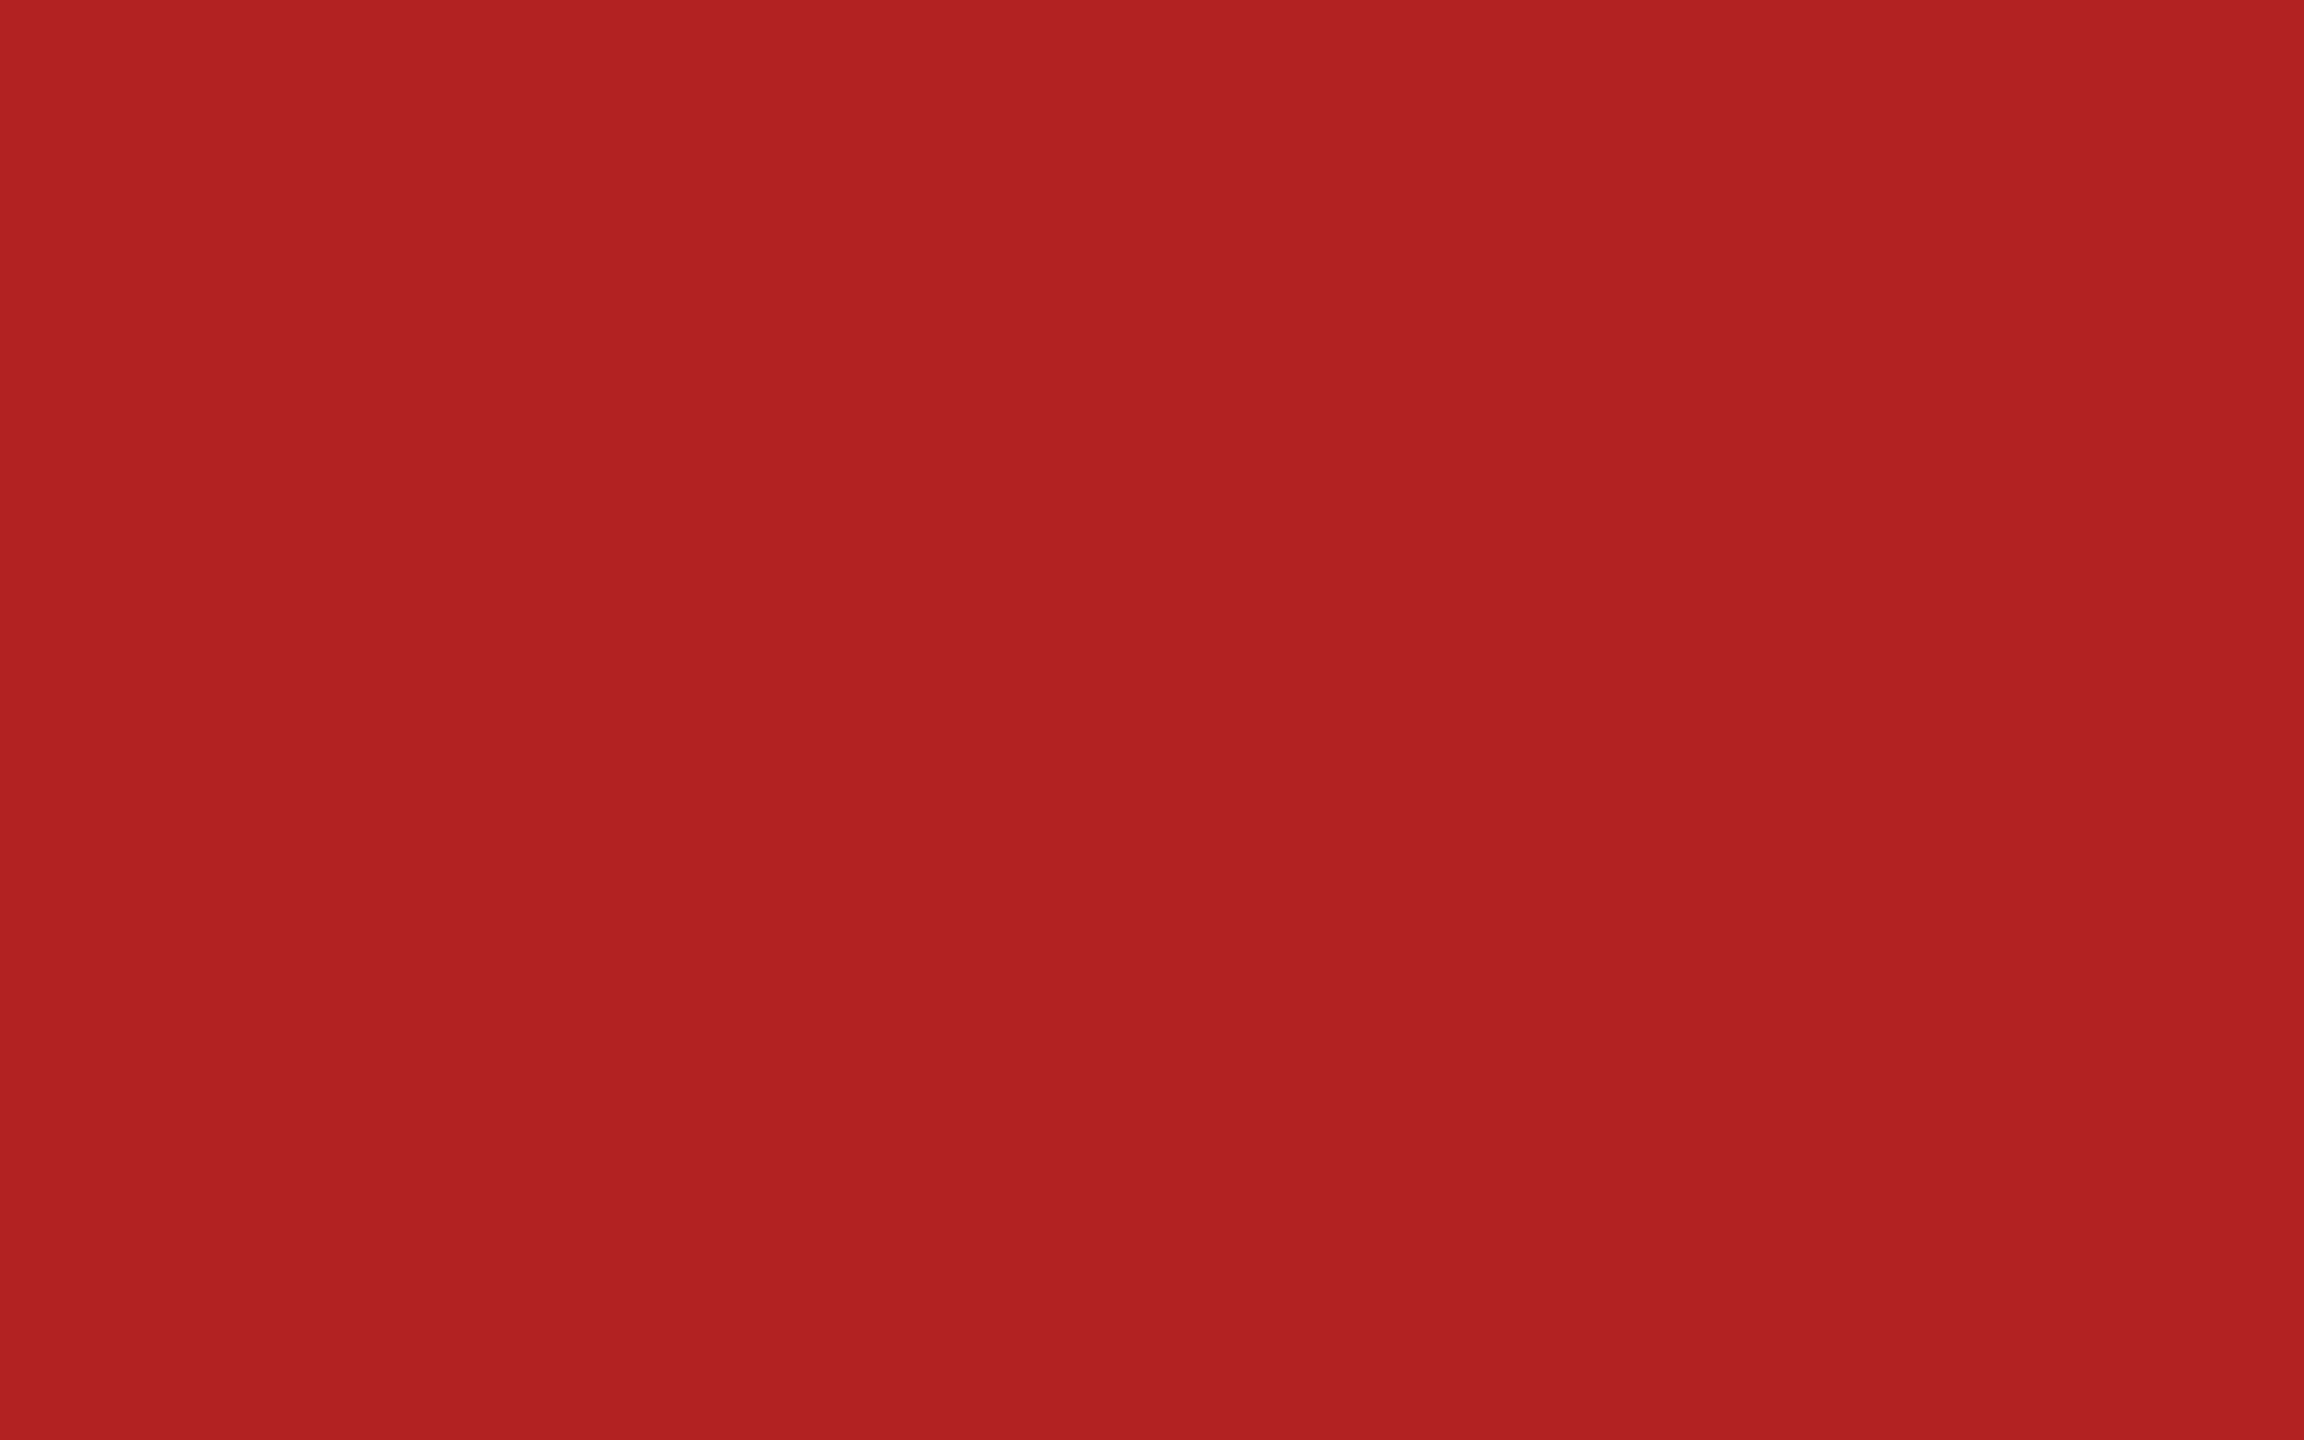 2304x1440 Firebrick Solid Color Background